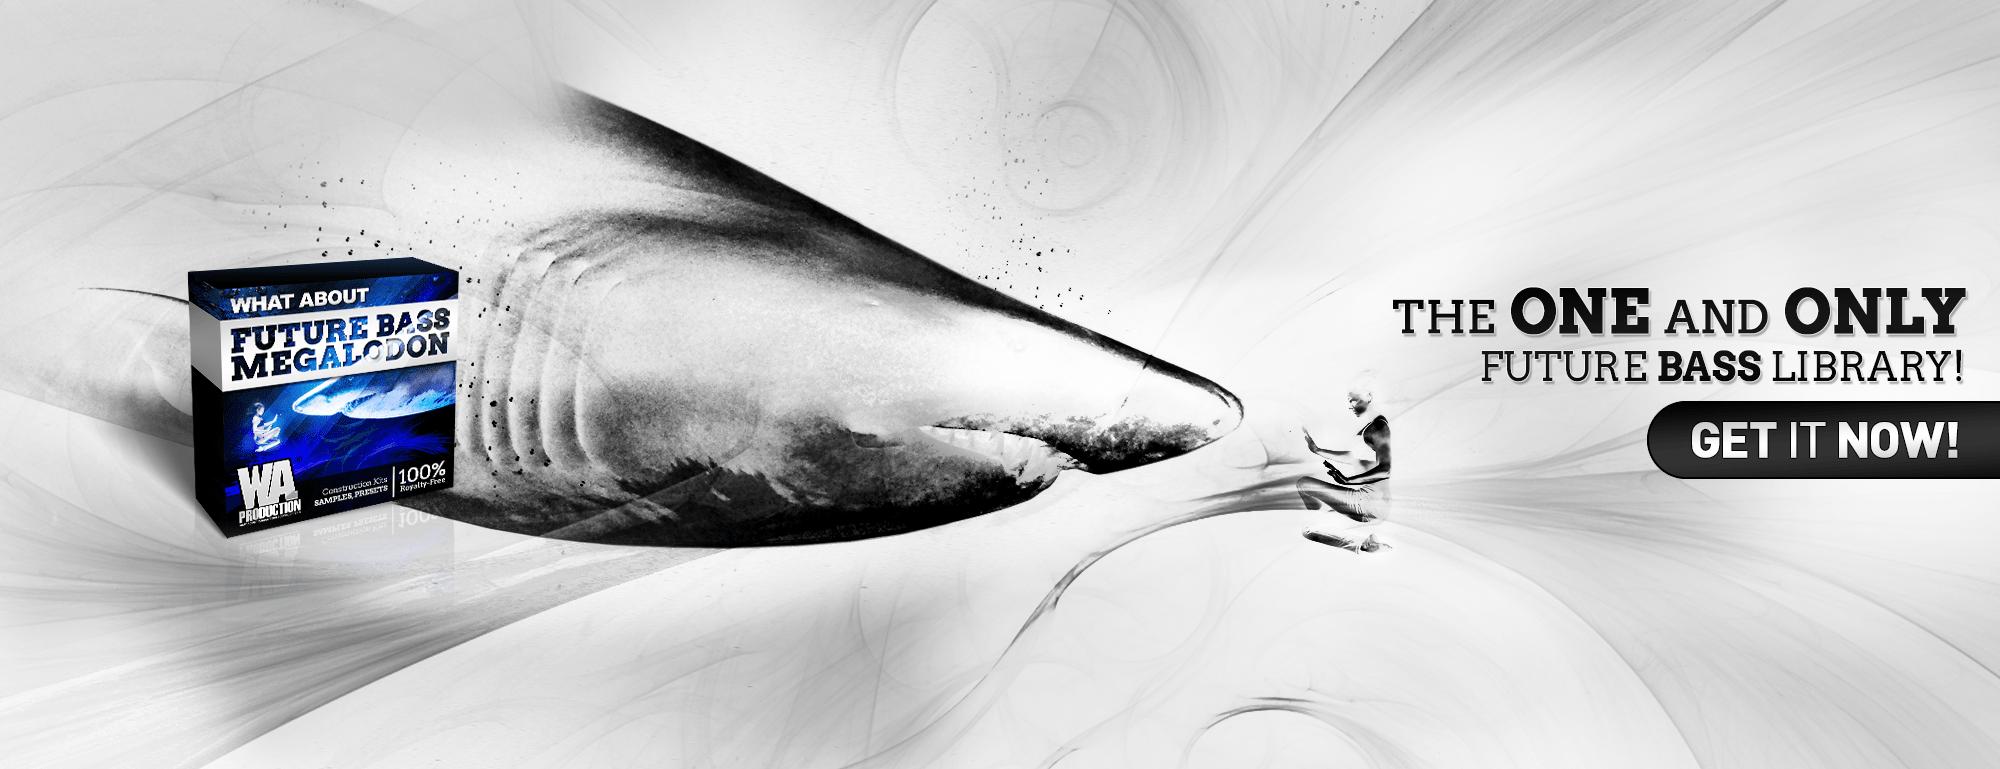 Future Bass Megalodon